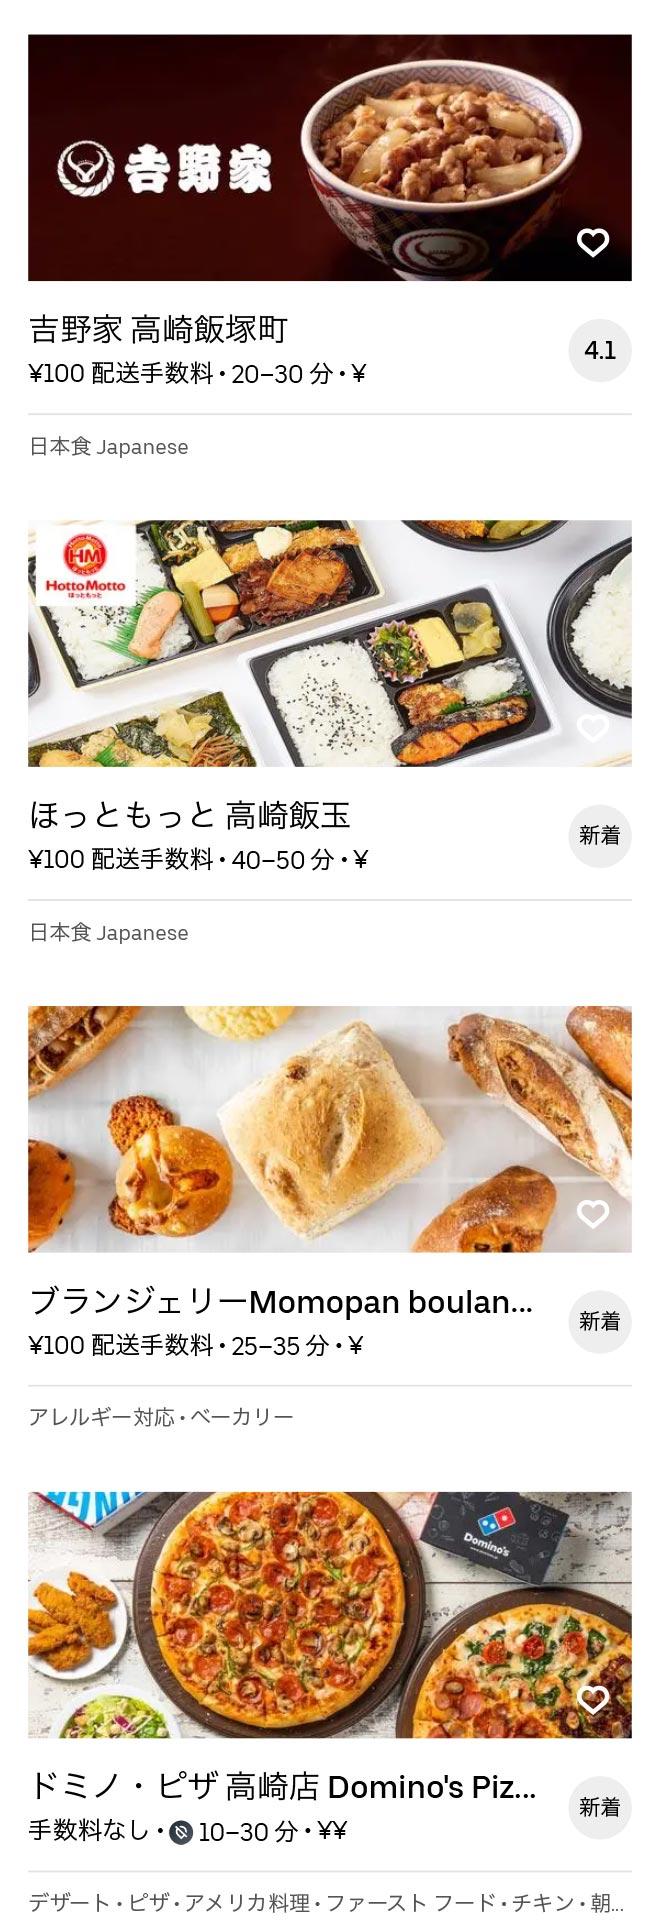 Tonyamachi menu 2010 03